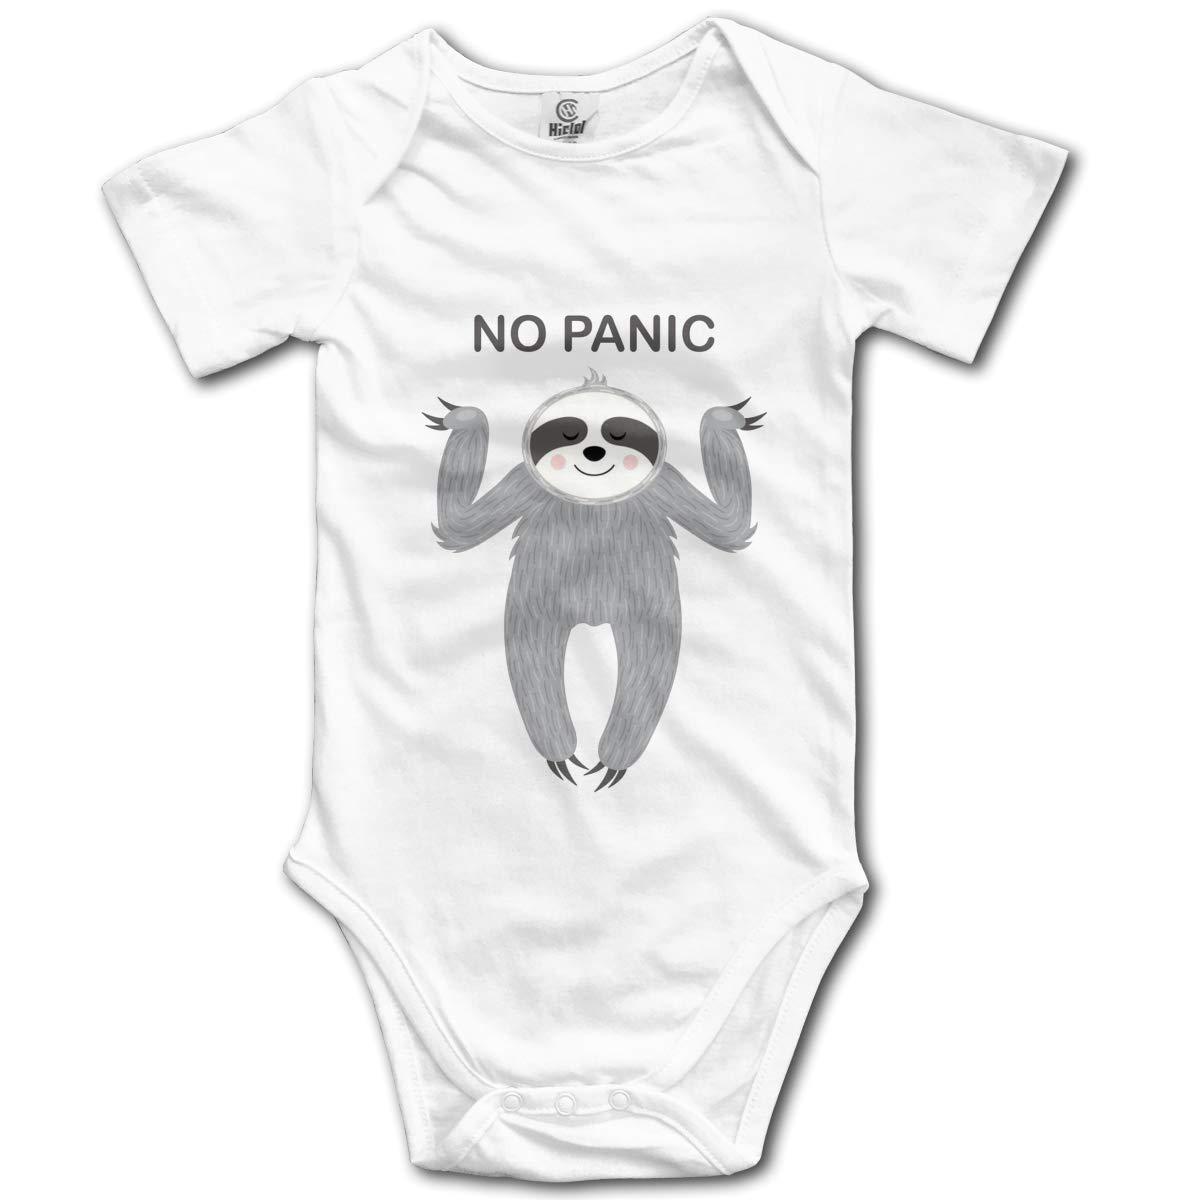 Sloth No Panic Baby Romper 0-18 Months Newborn Baby Girls Boys Layette Rompers Black